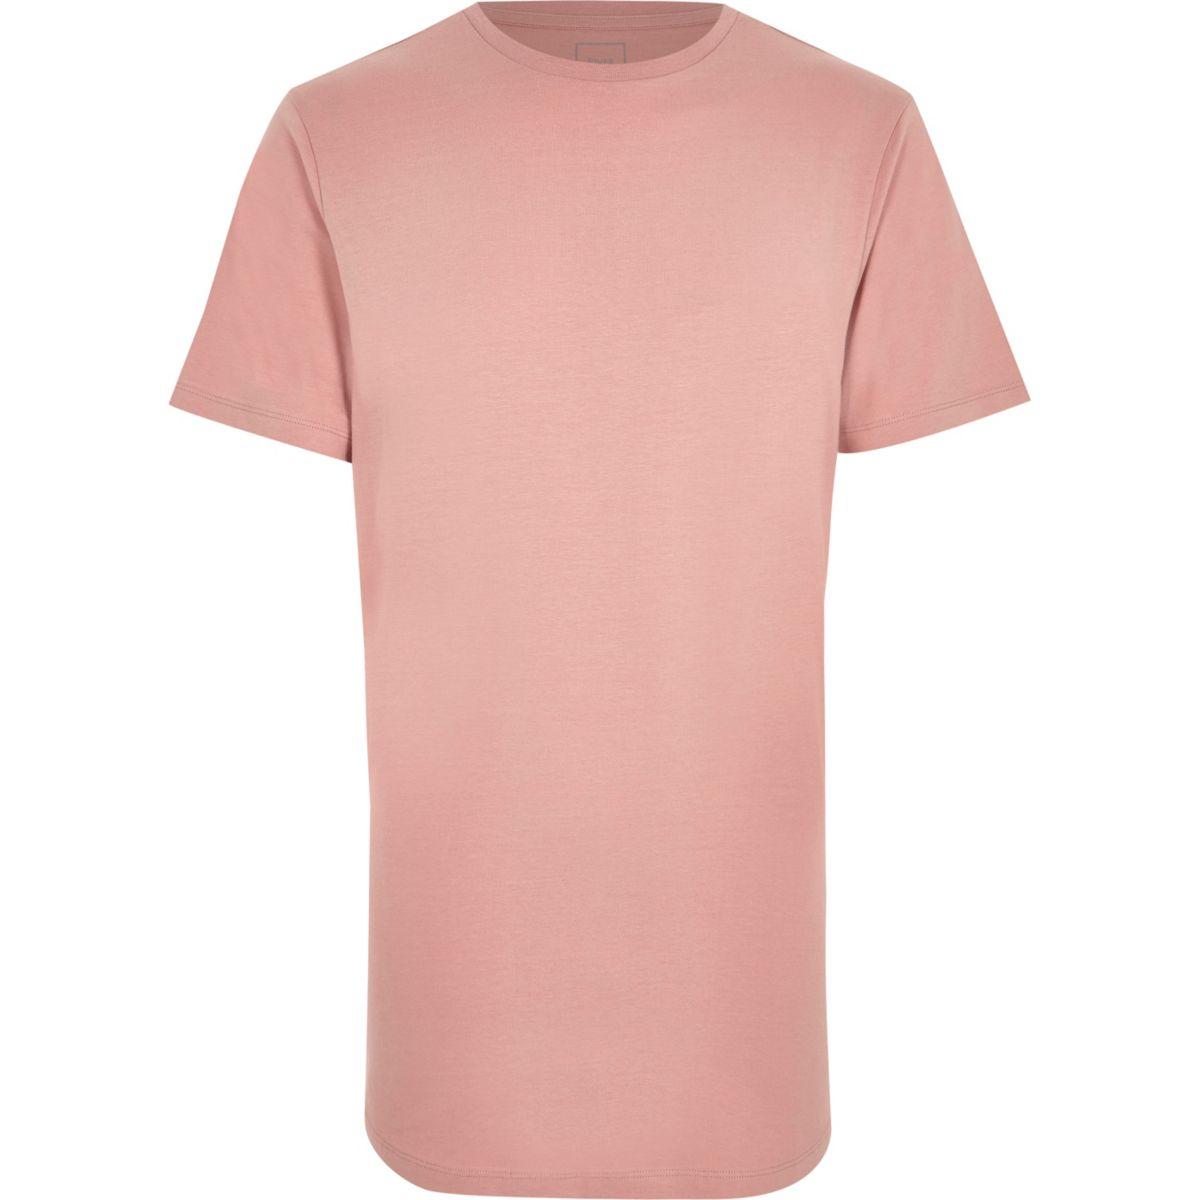 Pink curved hem crew neck T-shirt